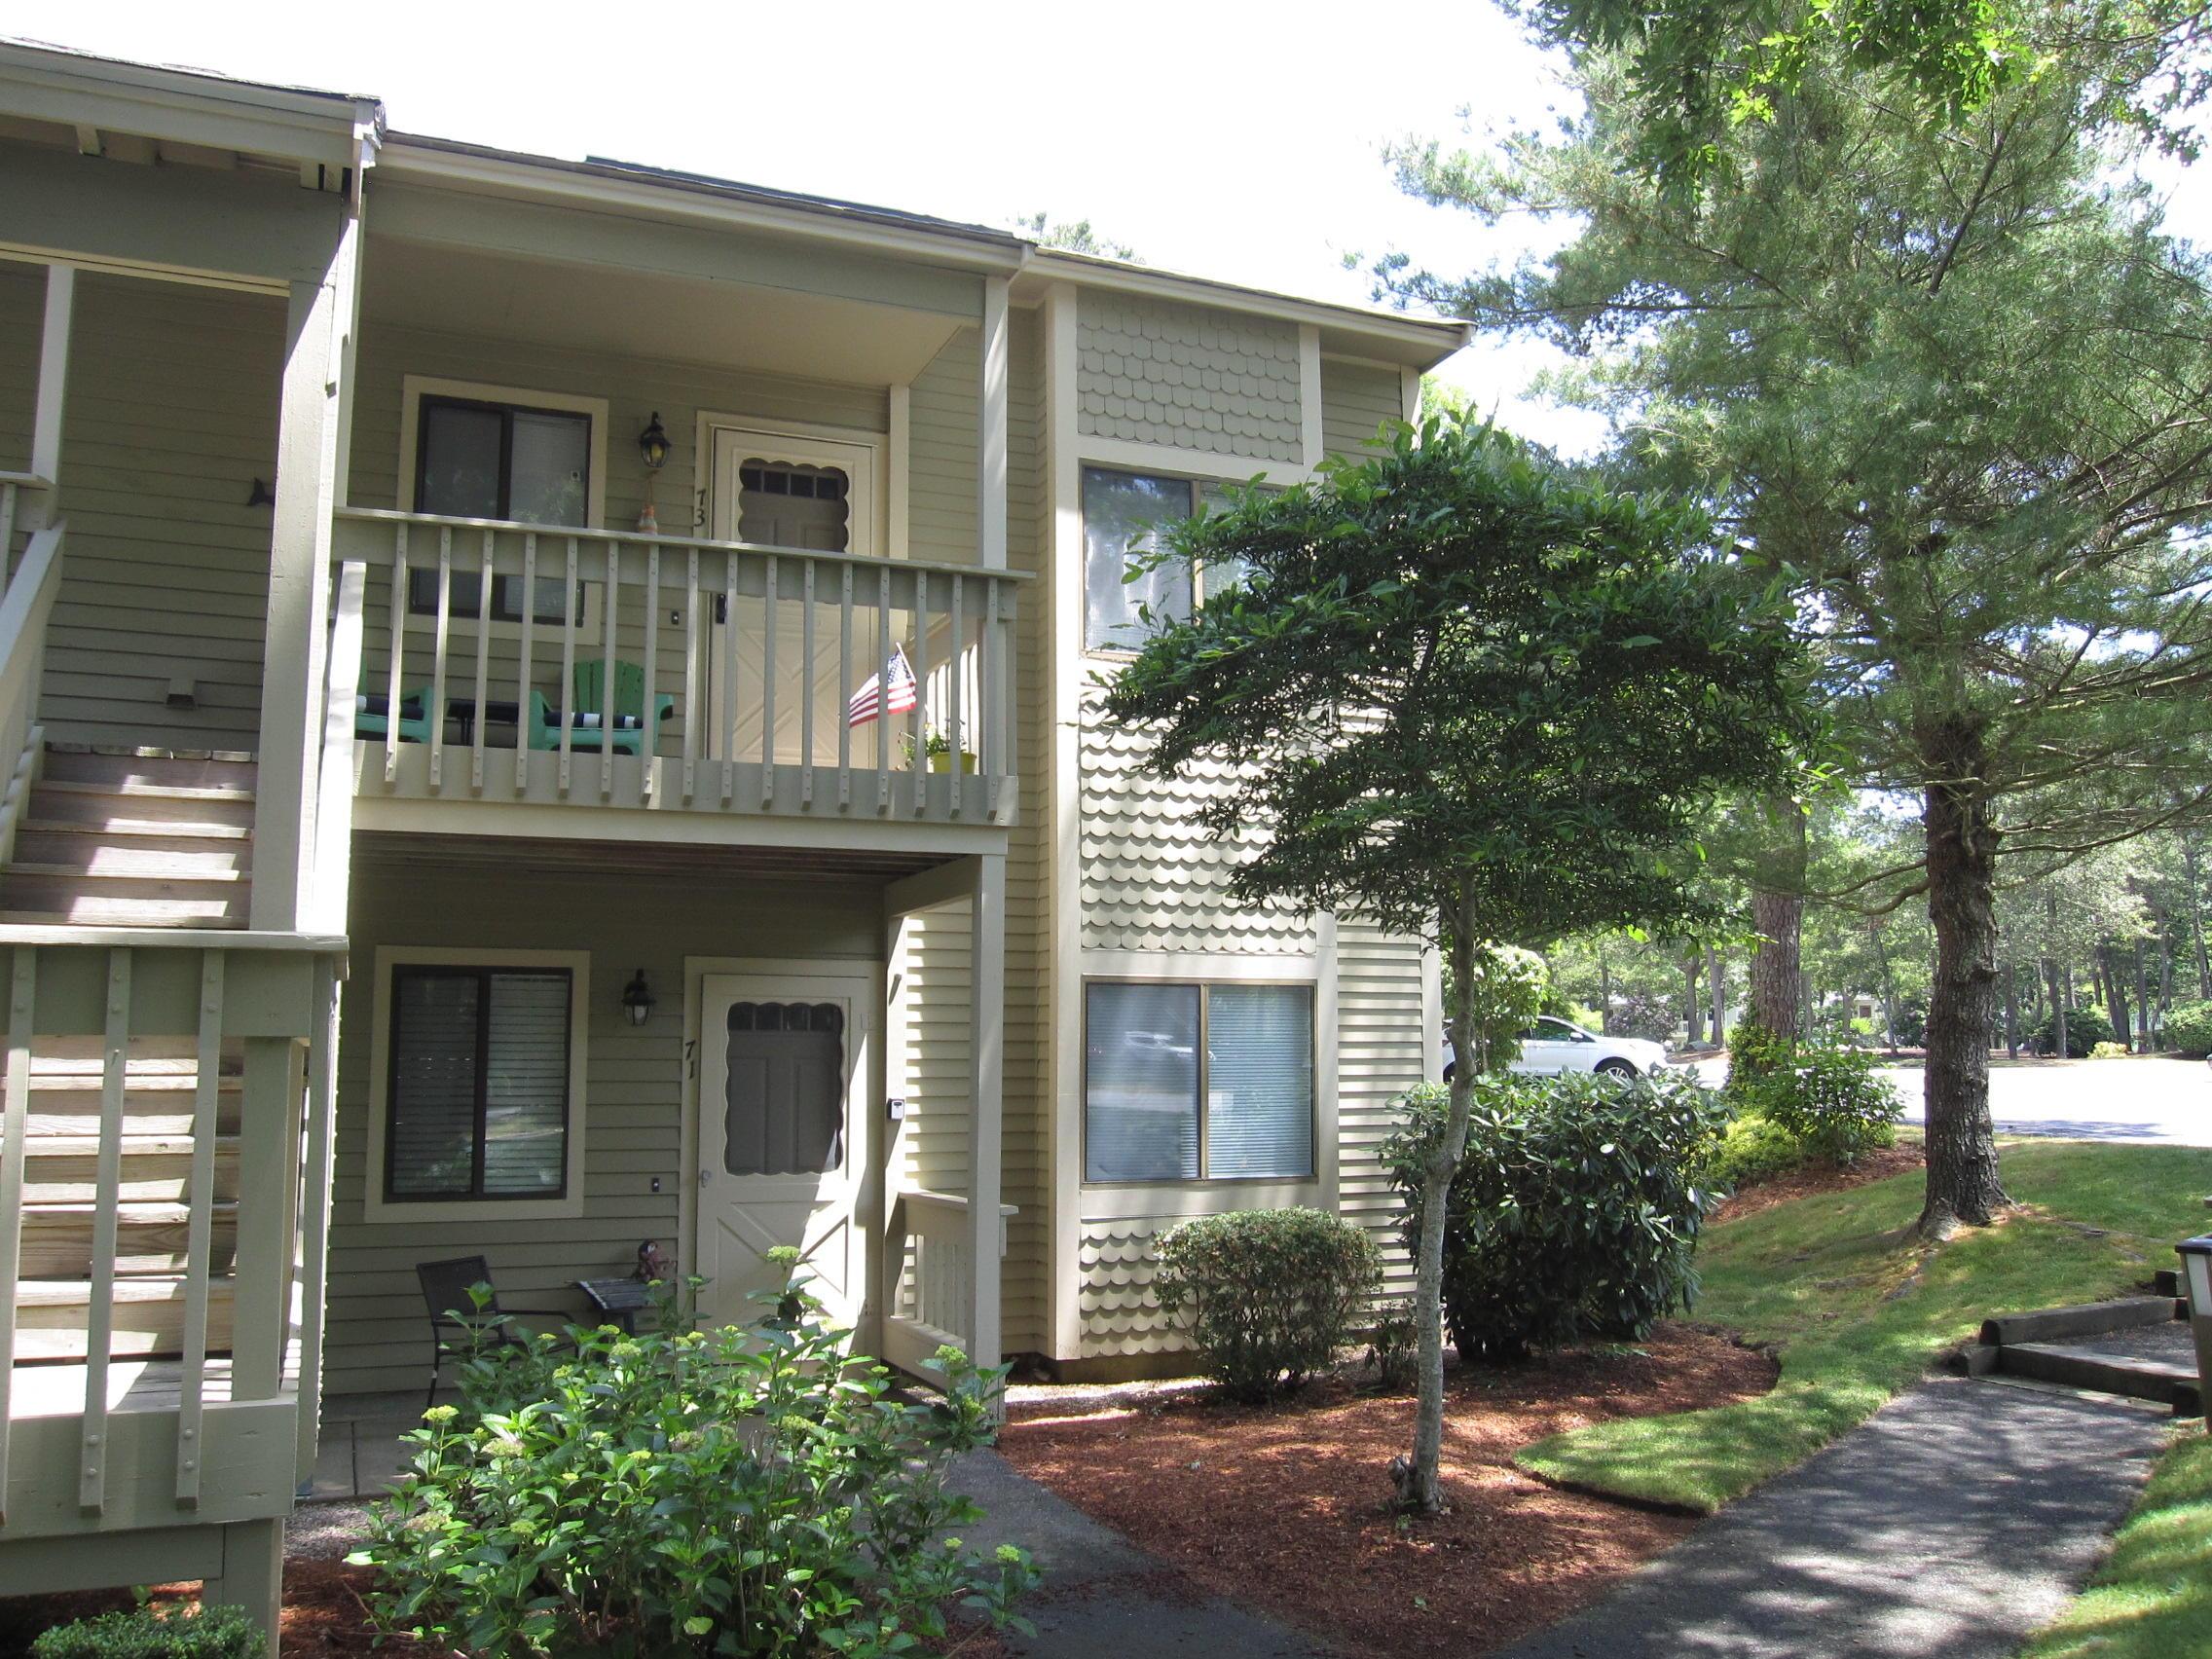 73 Eaton Lane, Brewster MA, 02631 sales details